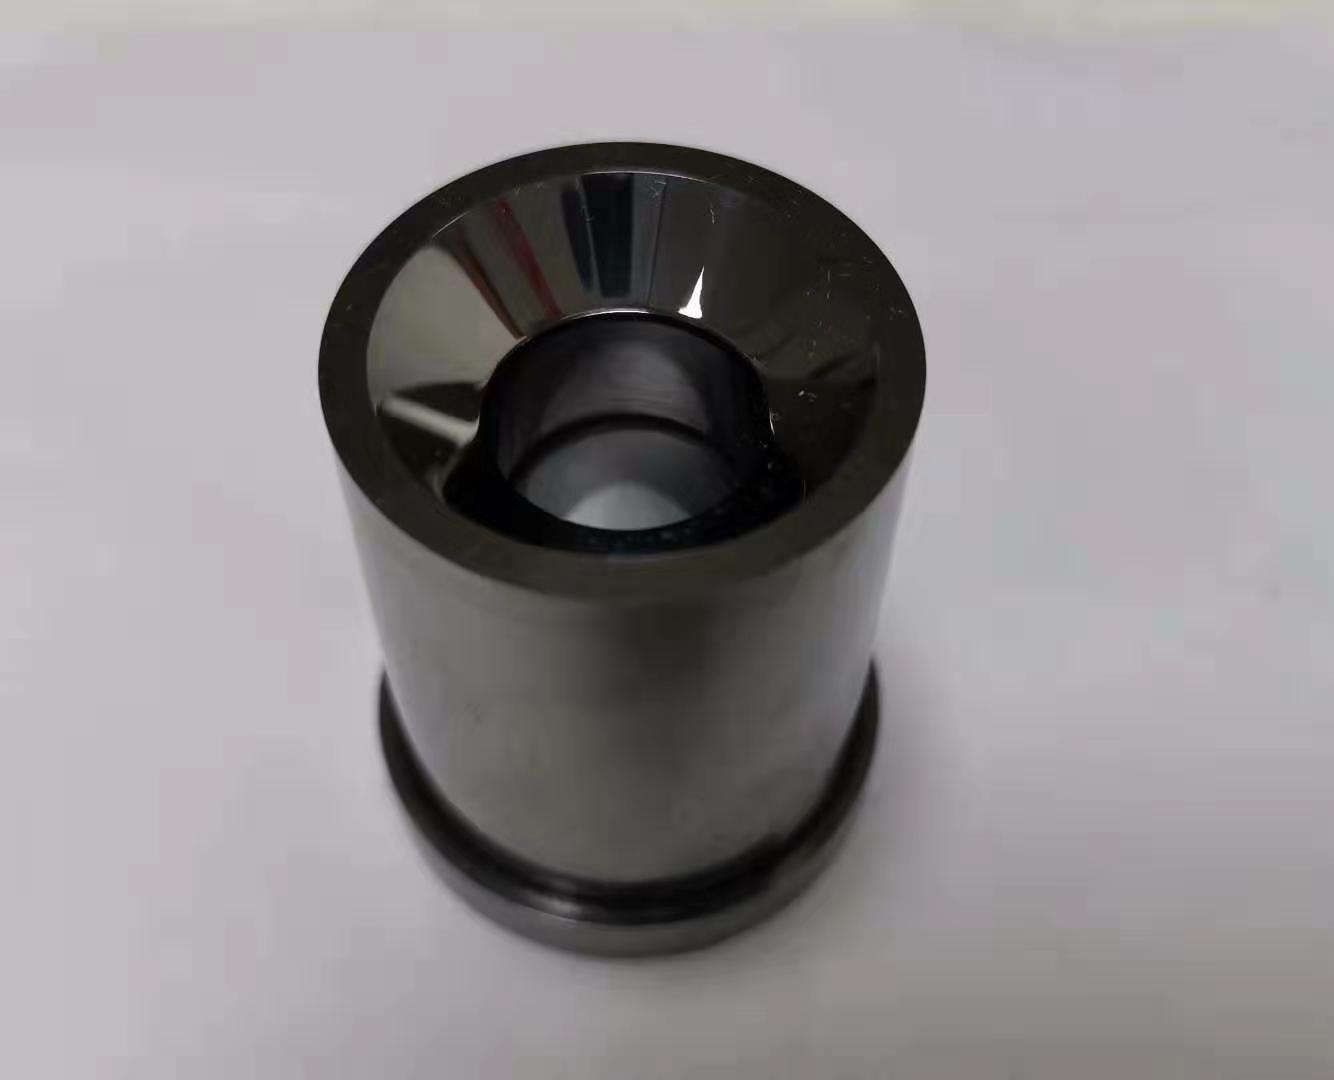 Precision Pierce Punch Extrusion Dies Ceramic Parts Manufacturer 4